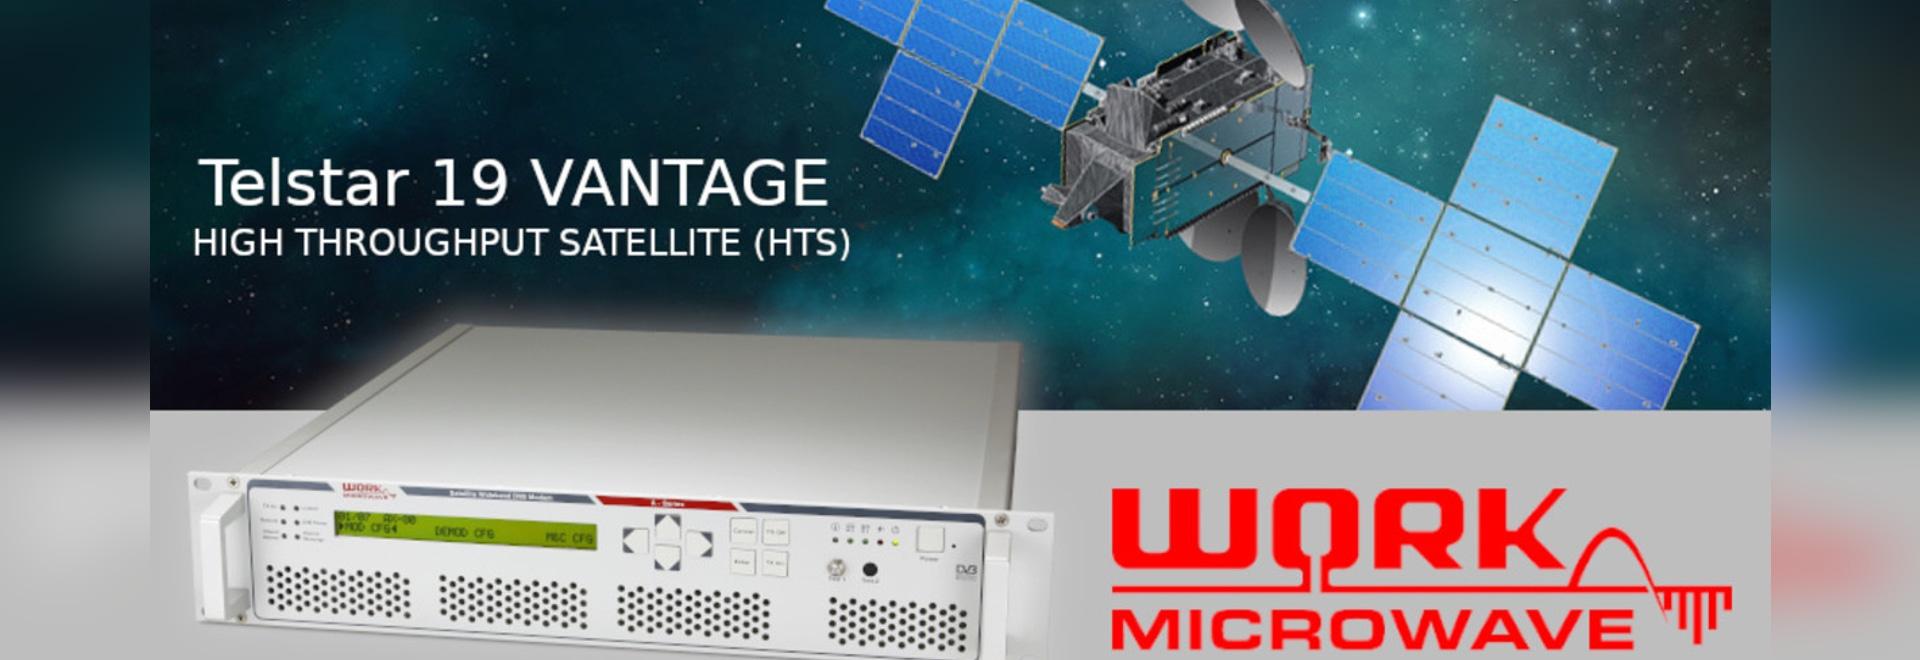 WORK Microwave transformiert maritimes SatCom